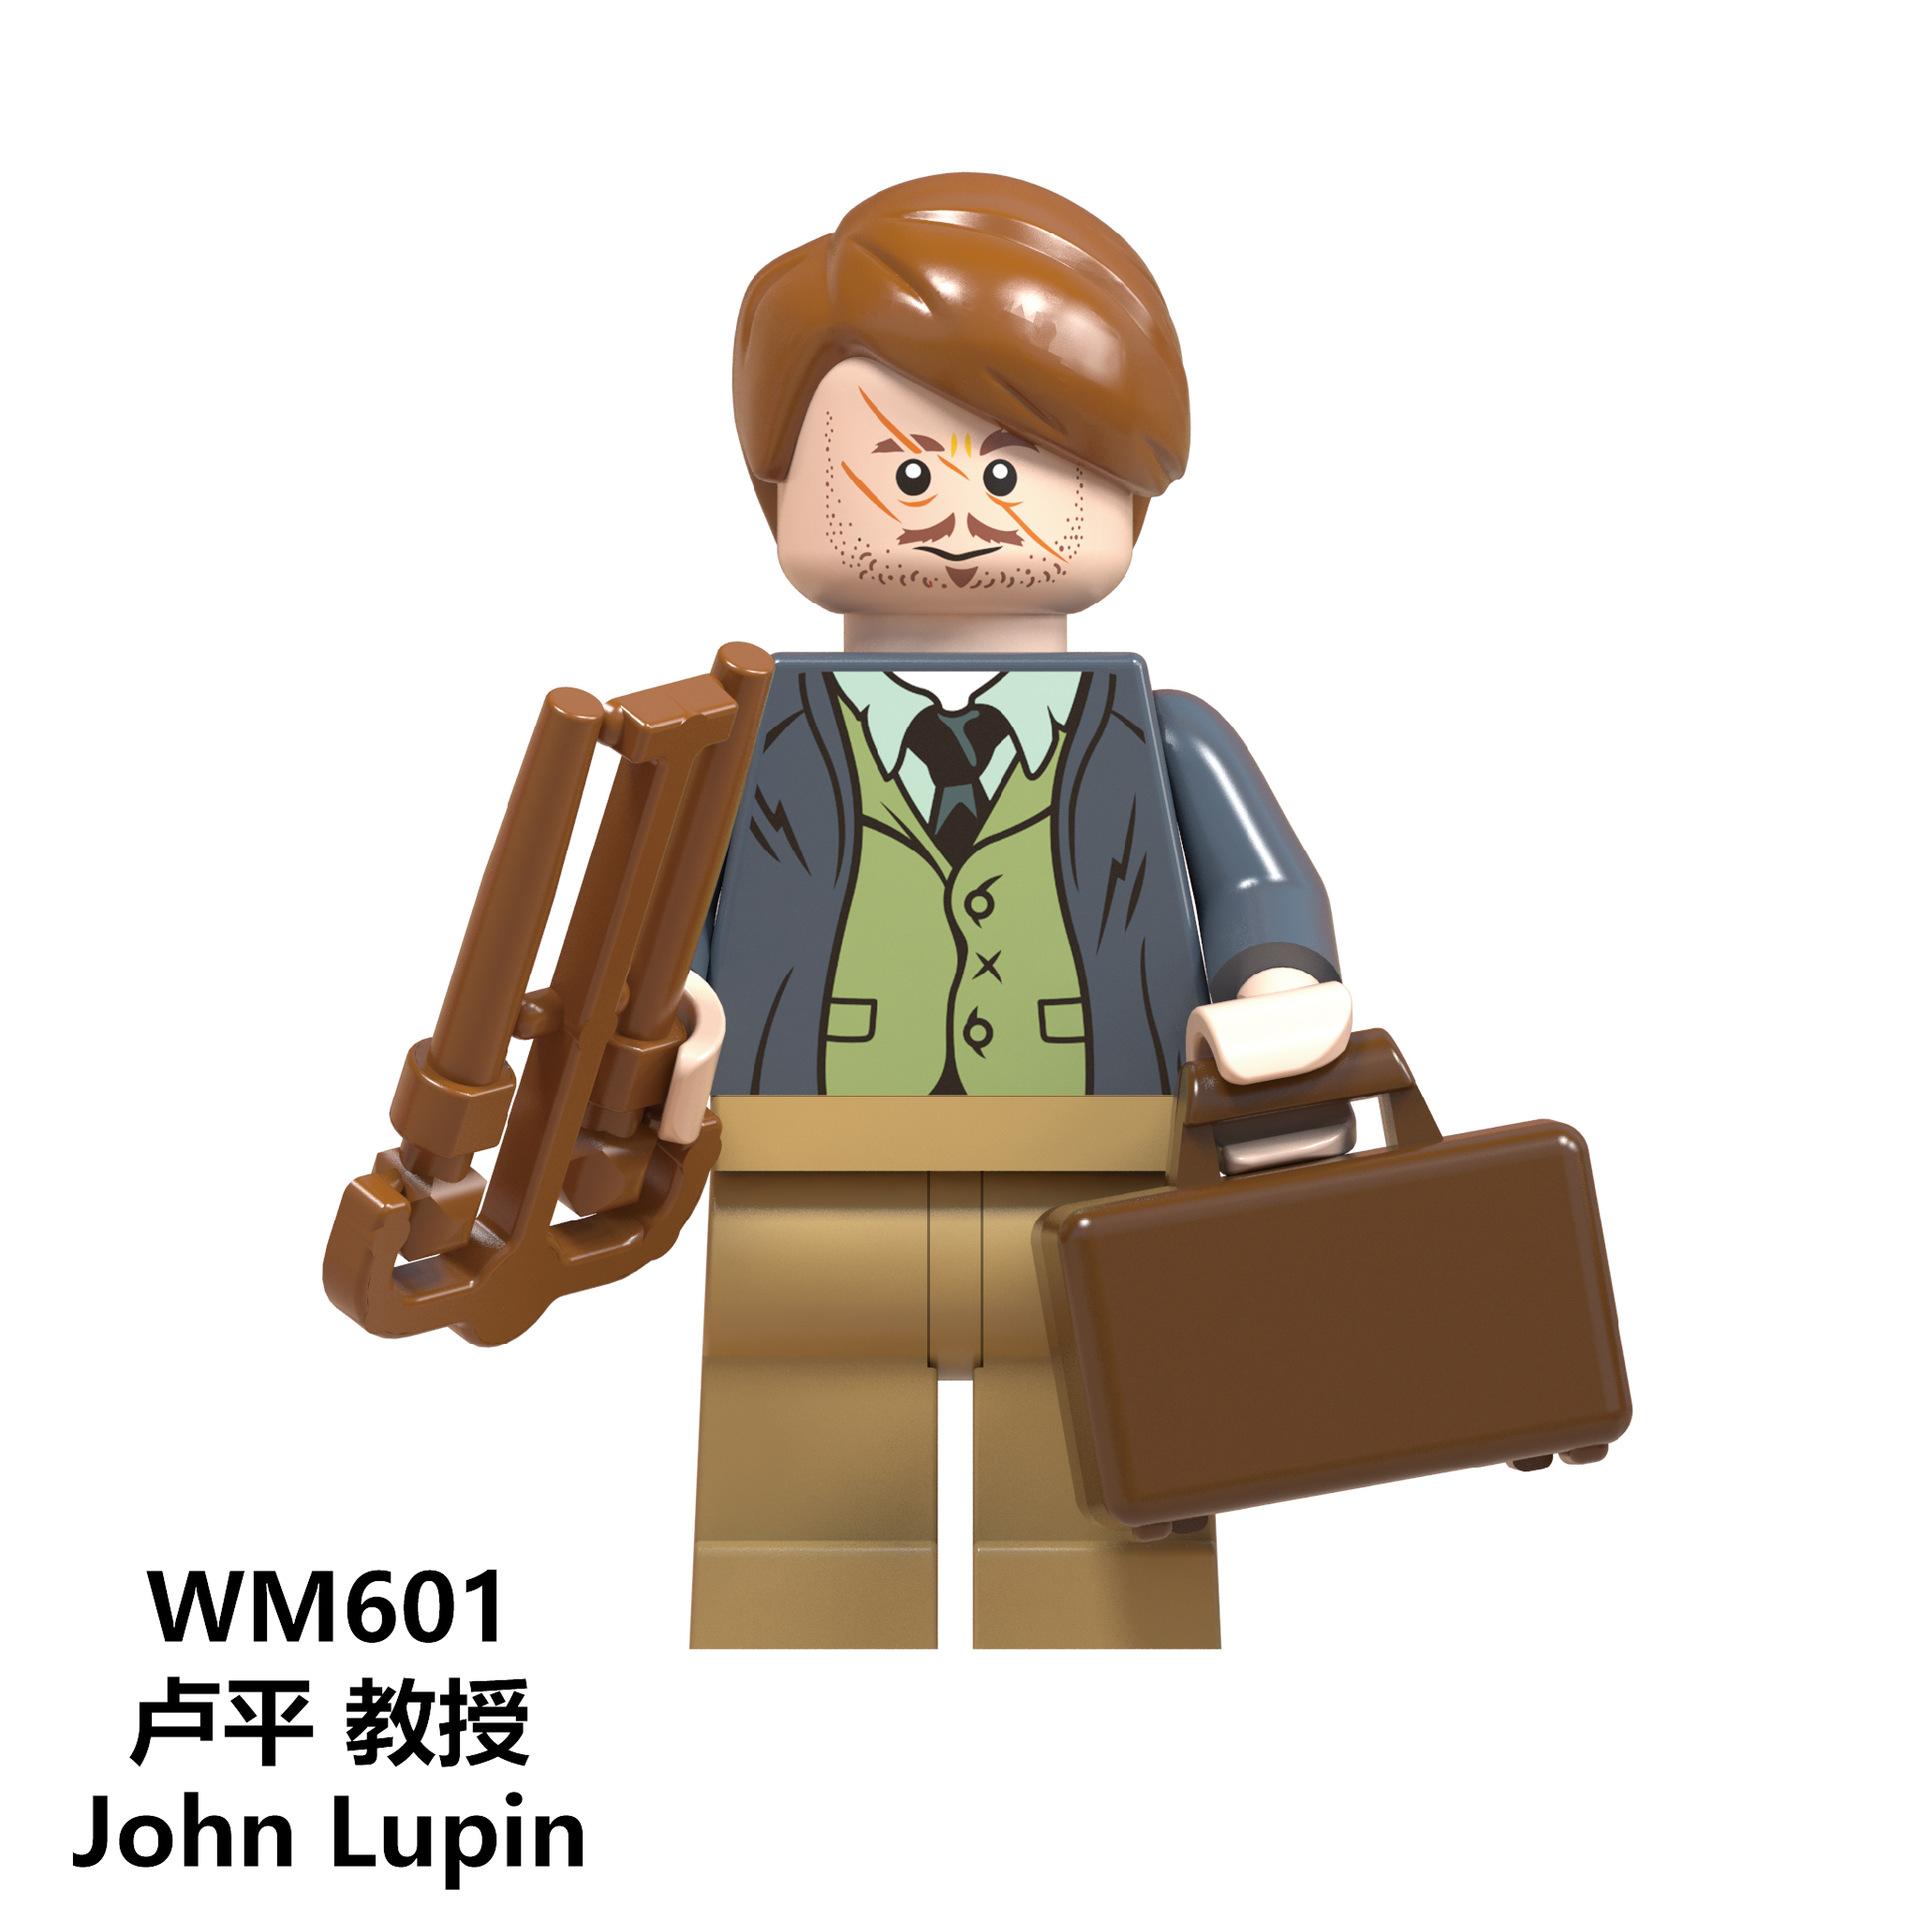 WM601